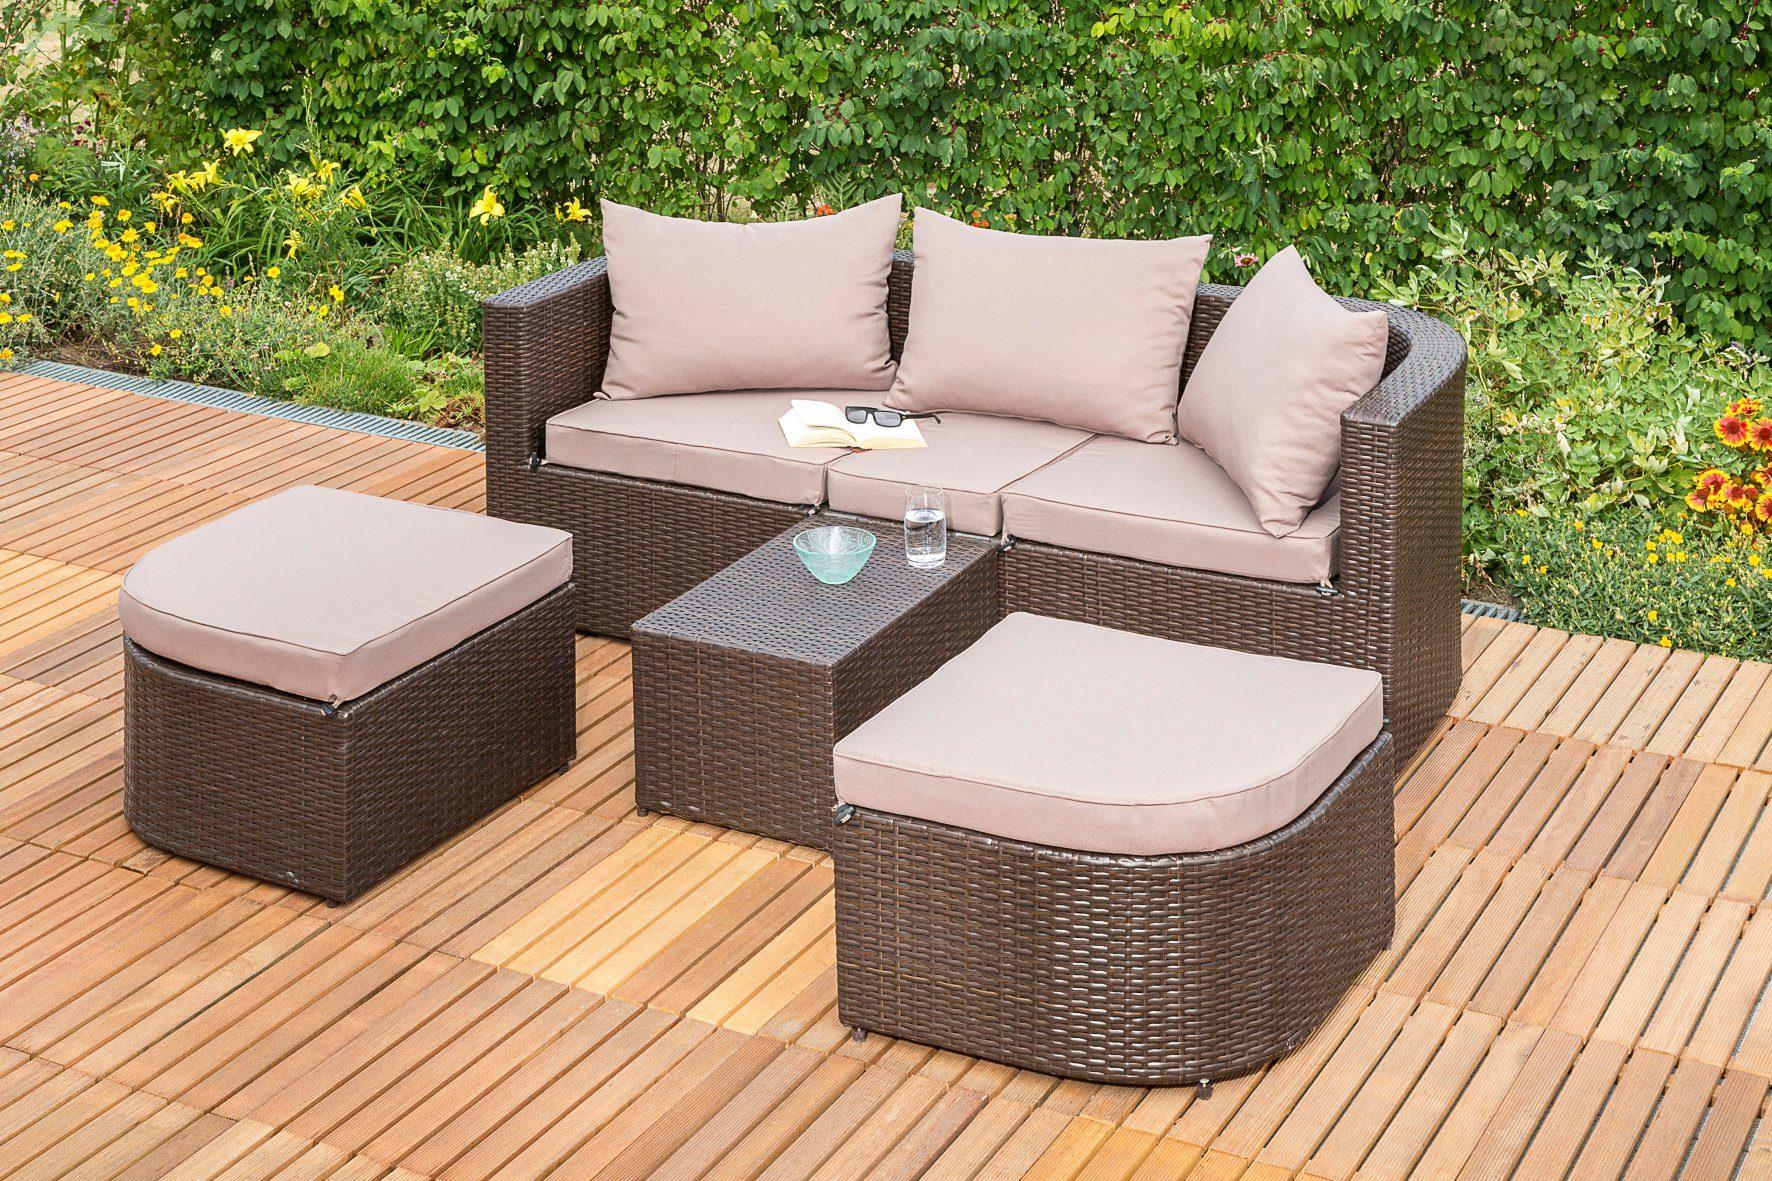 MERXX Loungebett »Madeira«, Polyrattan, braun, inkl. Auflagen